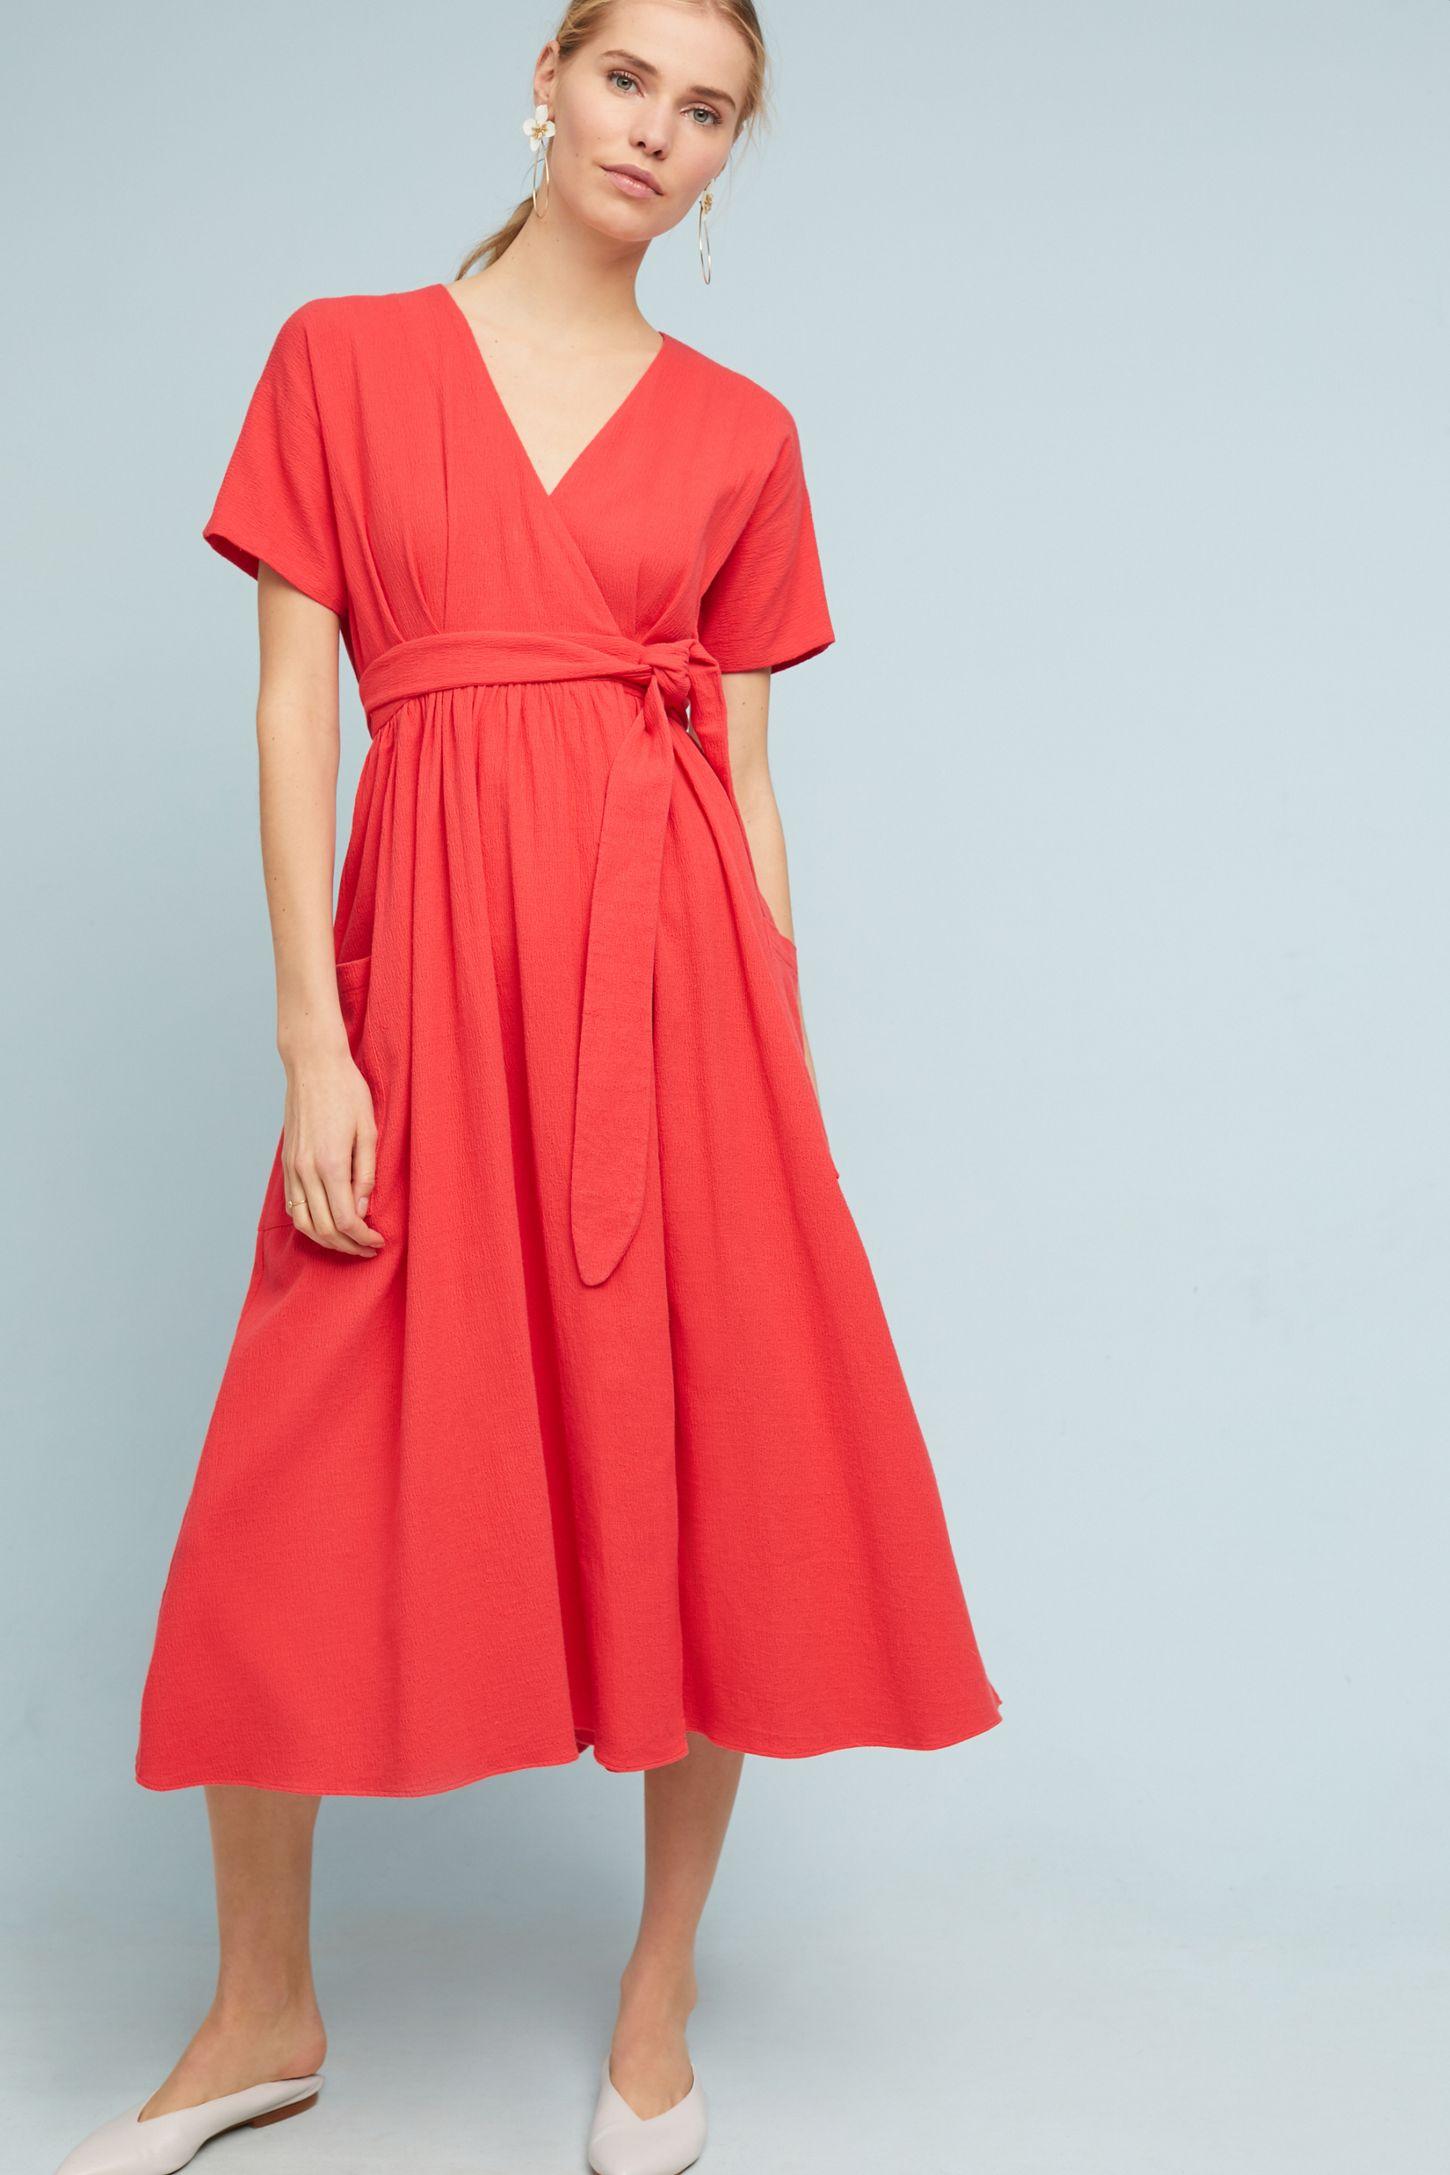 08f124a37f82 Mara Hoffman Ingrid Belted Dress | Anthropologie